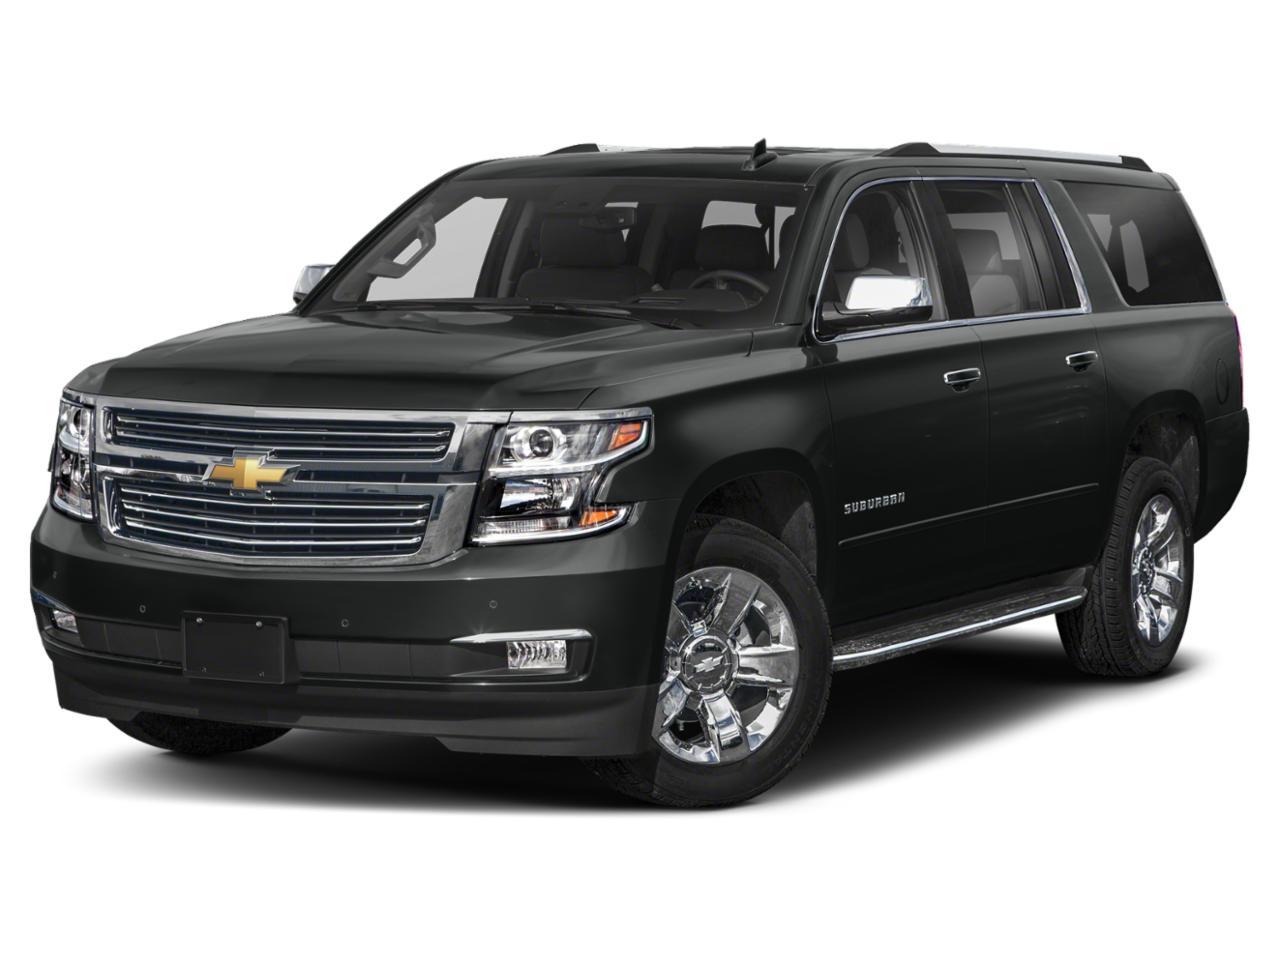 2020 Chevrolet Suburban Vehicle Photo in Hamden, CT 06517